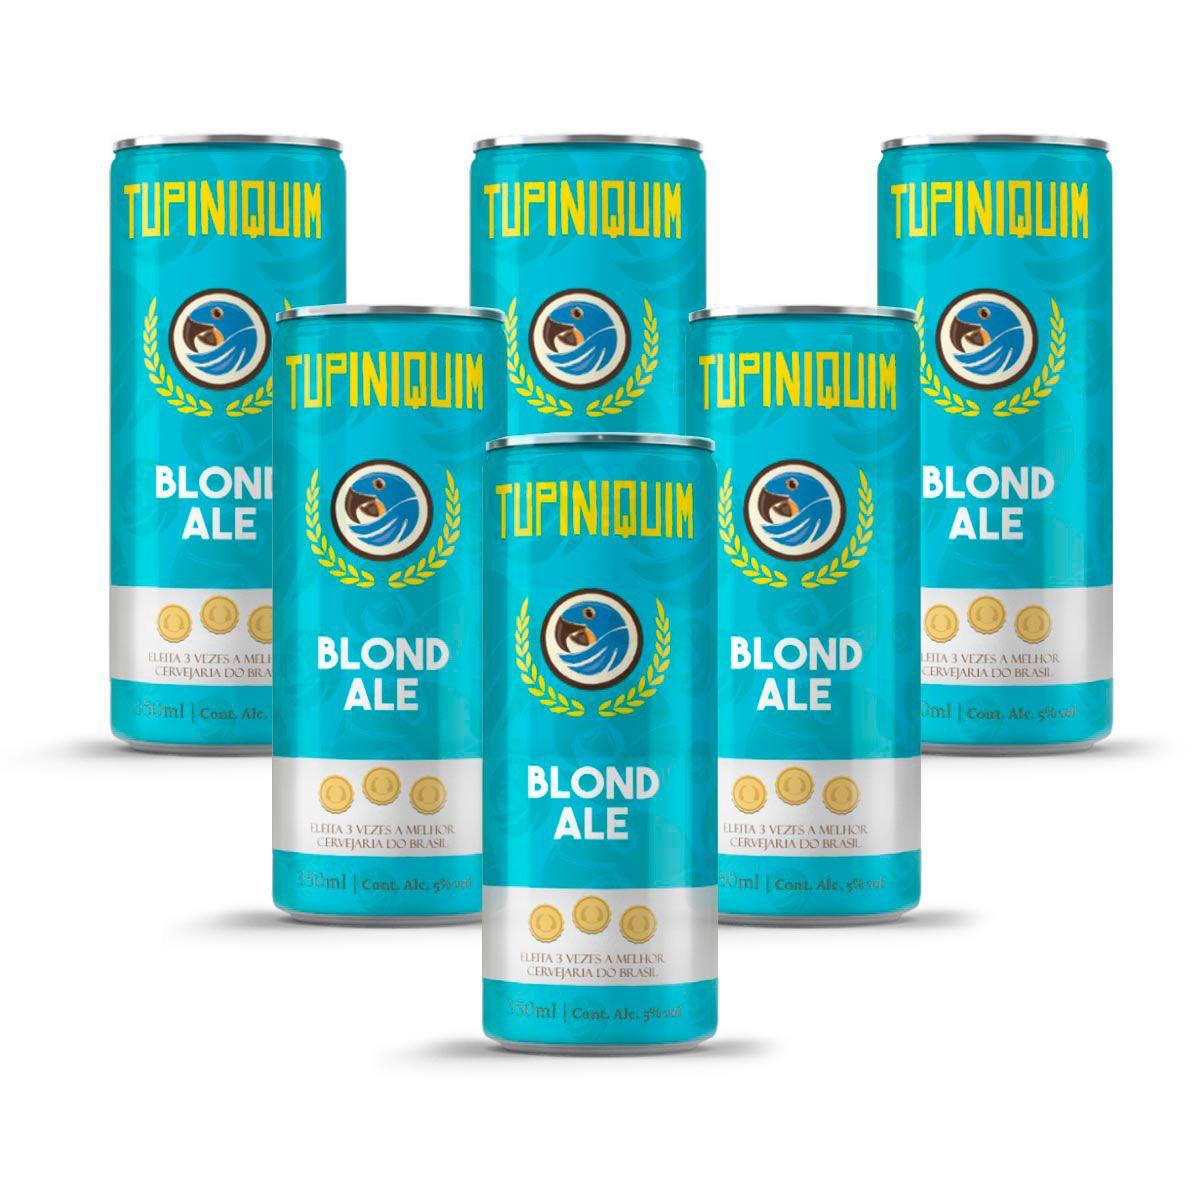 Pack Tupiniquim Blond Ale 6 latas 350ml